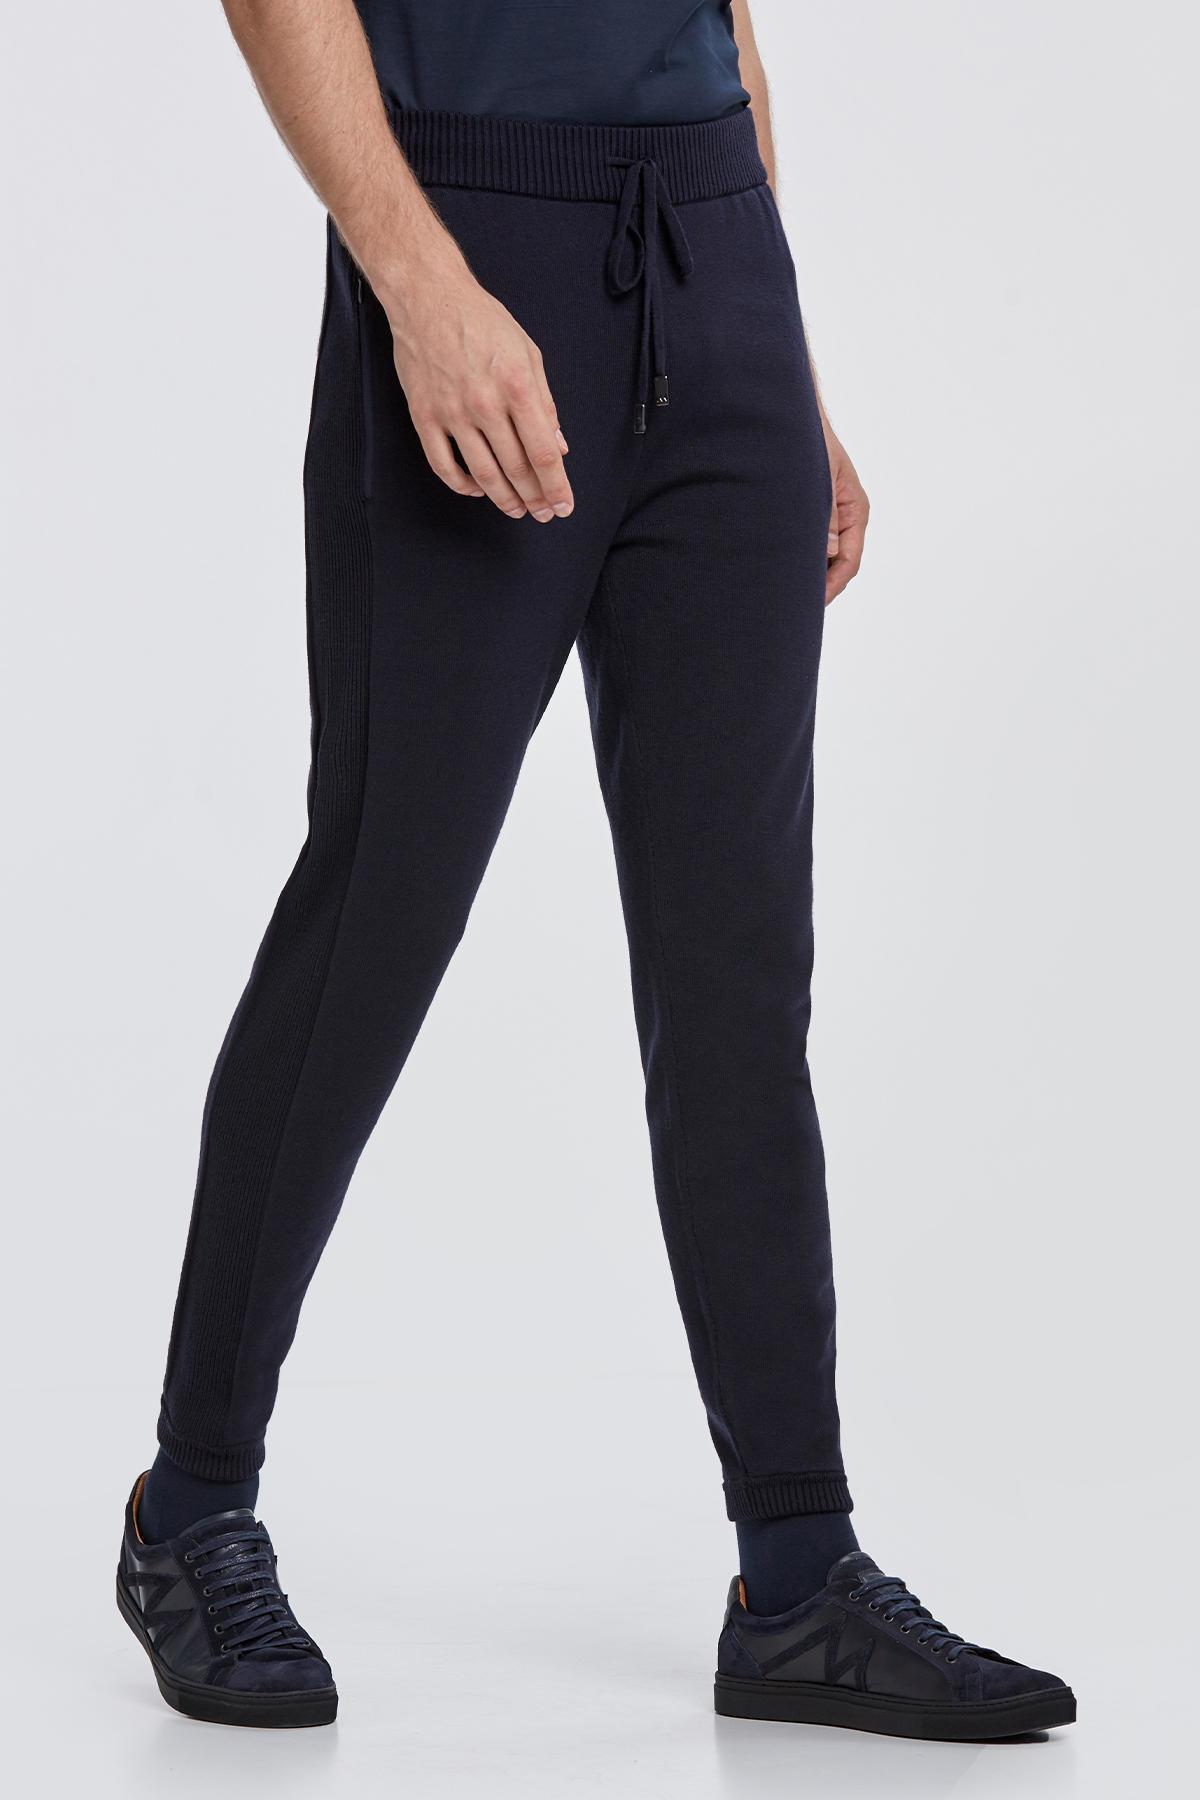 Merino Yün Lacivert Activewear Triko Pantolon